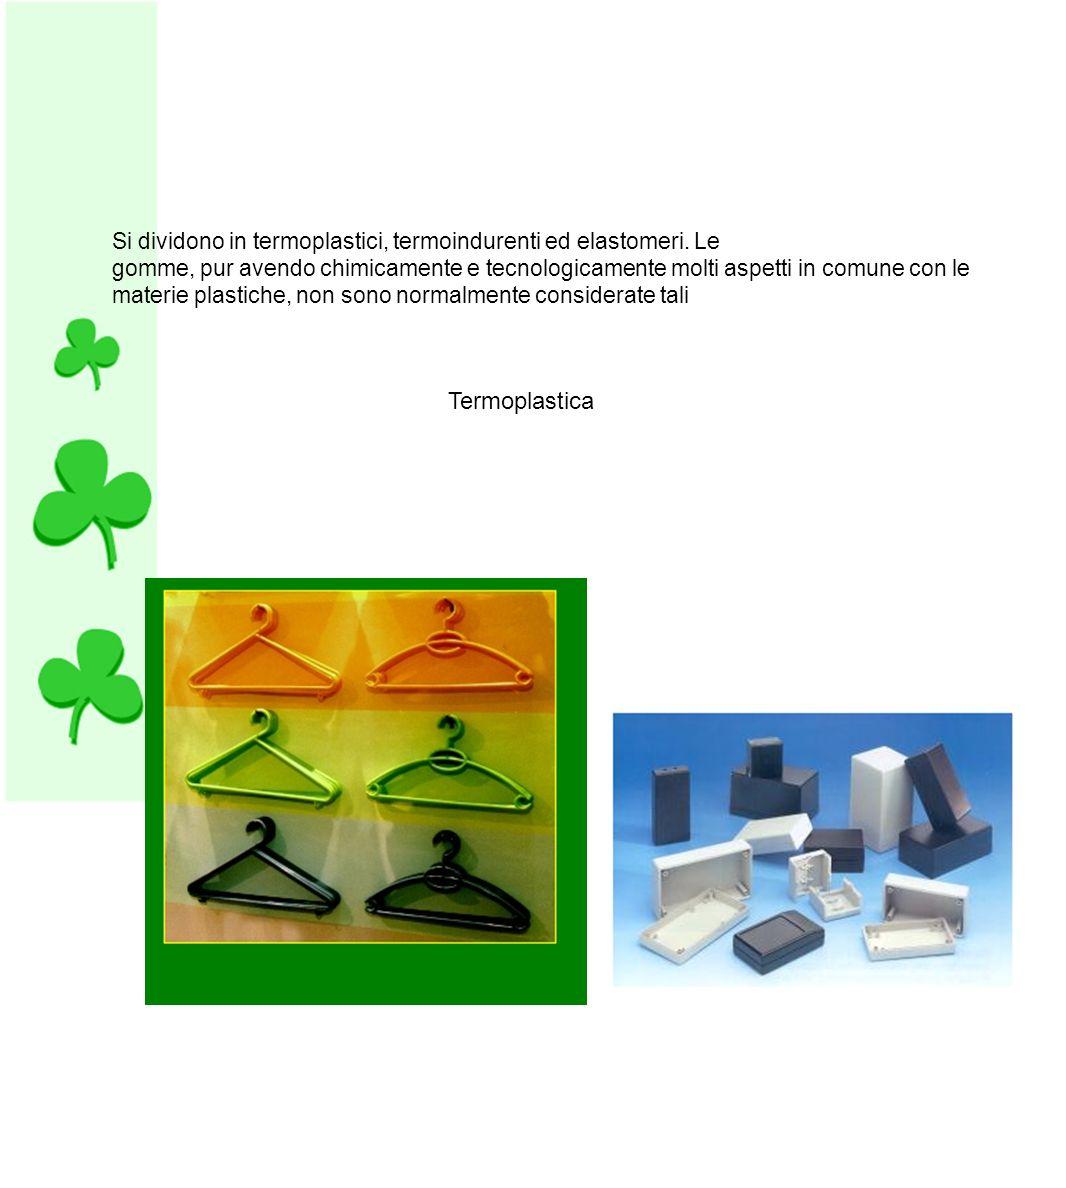 Si dividono in termoplastici, termoindurenti ed elastomeri. Le